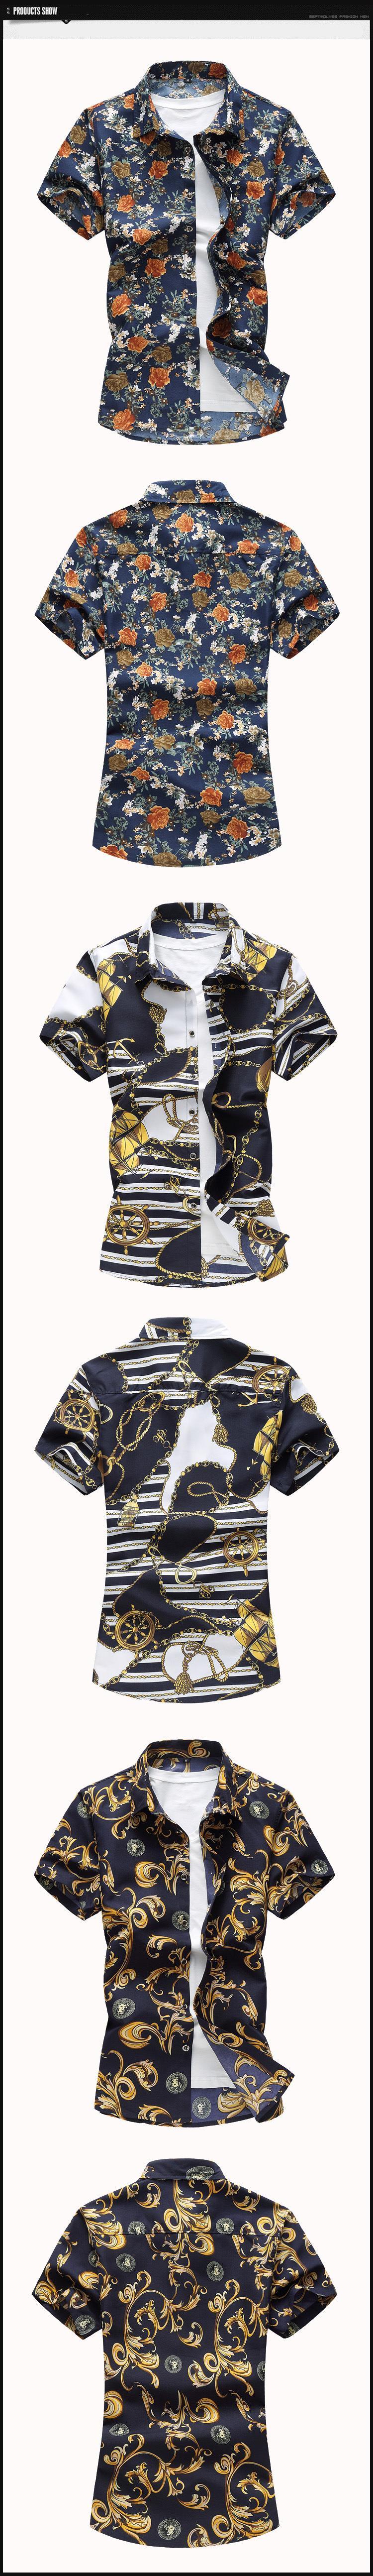 Fashion Men's Social Hawaiian Short Sleeves Shirt